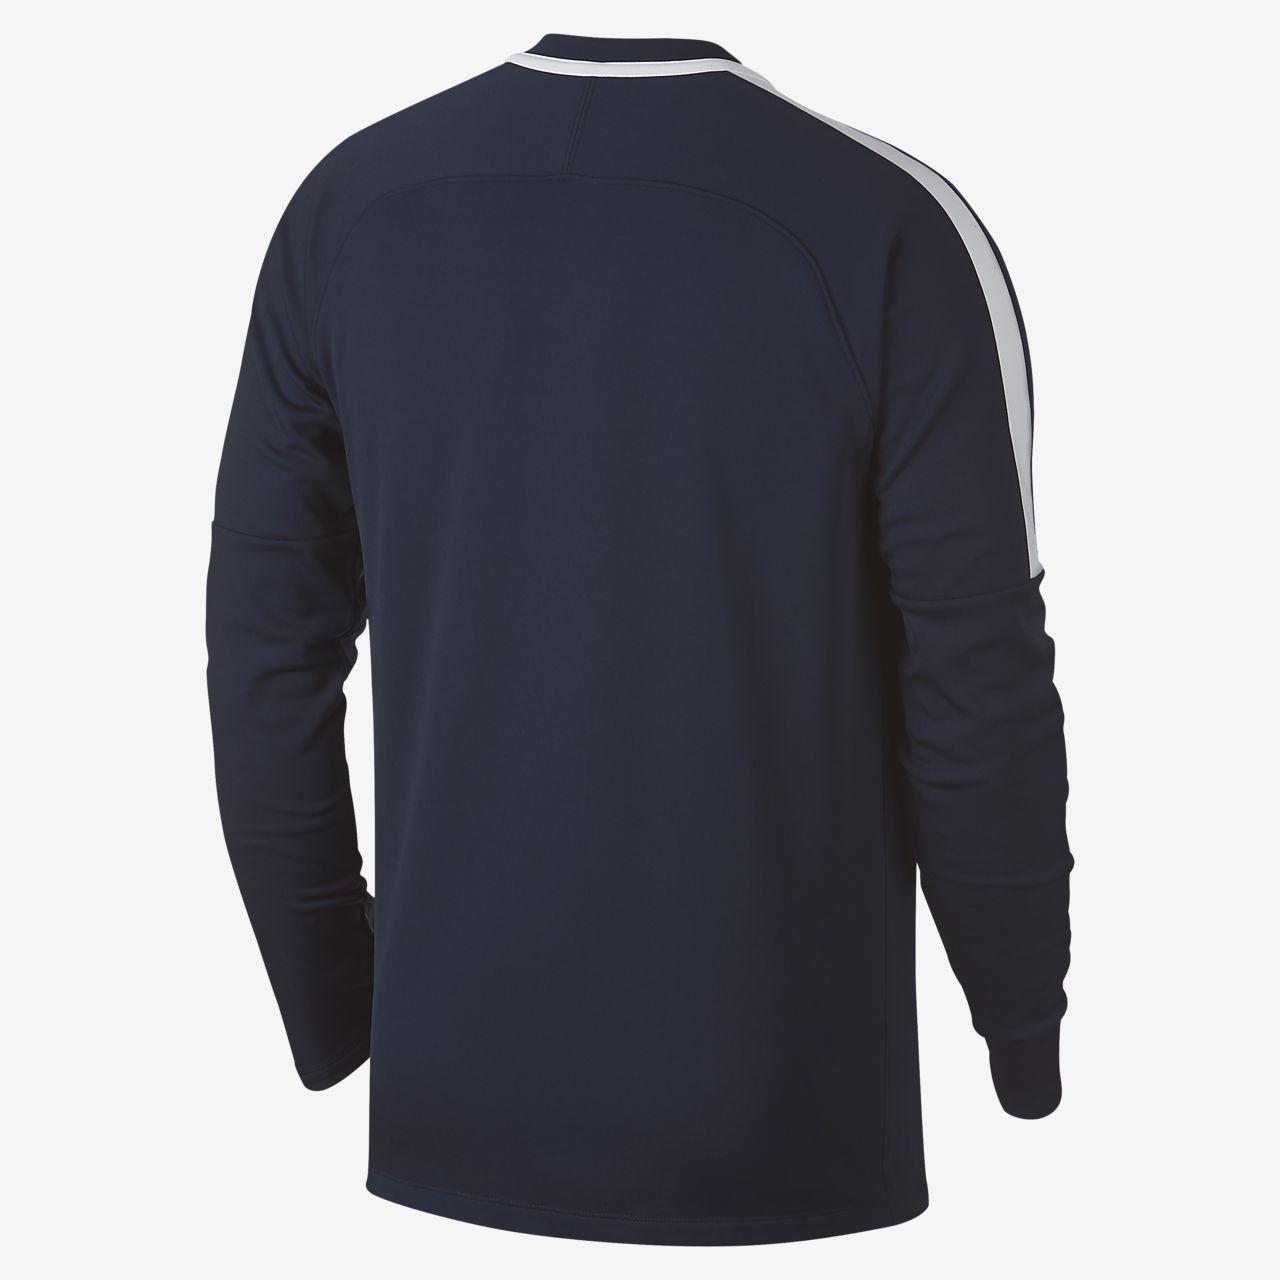 Men's Nike Dri Sweatshirt Fit Academy Football vNOmn80w